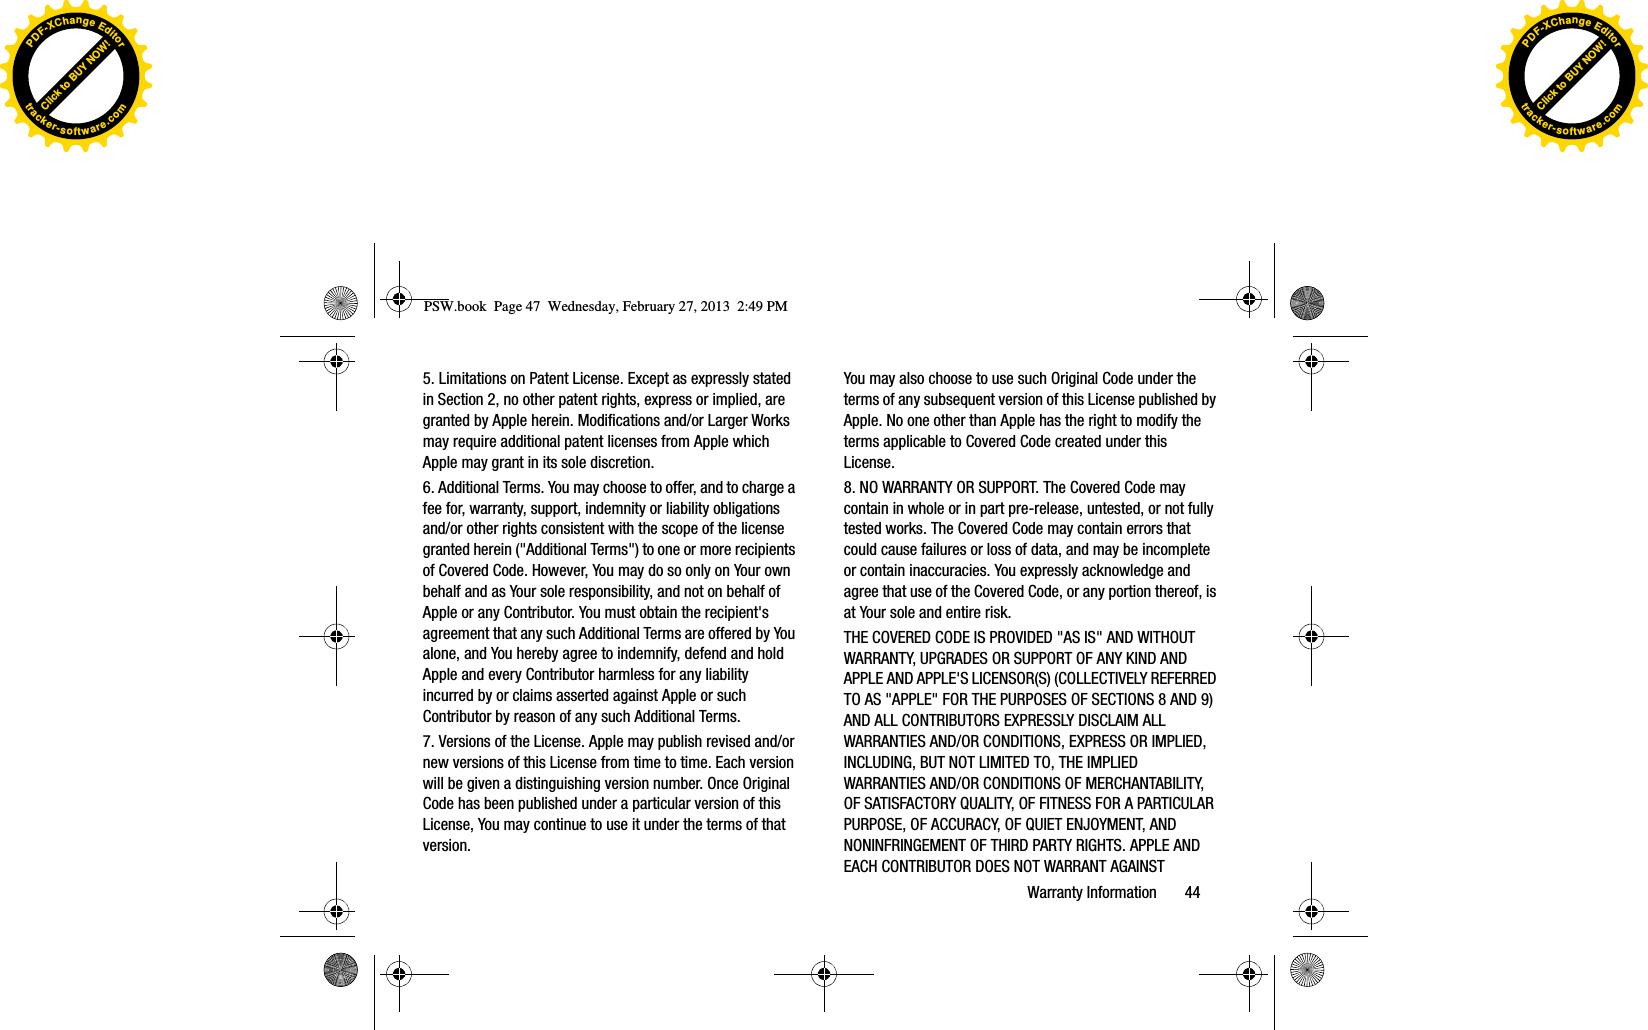 verizon samsung 4g lte manual